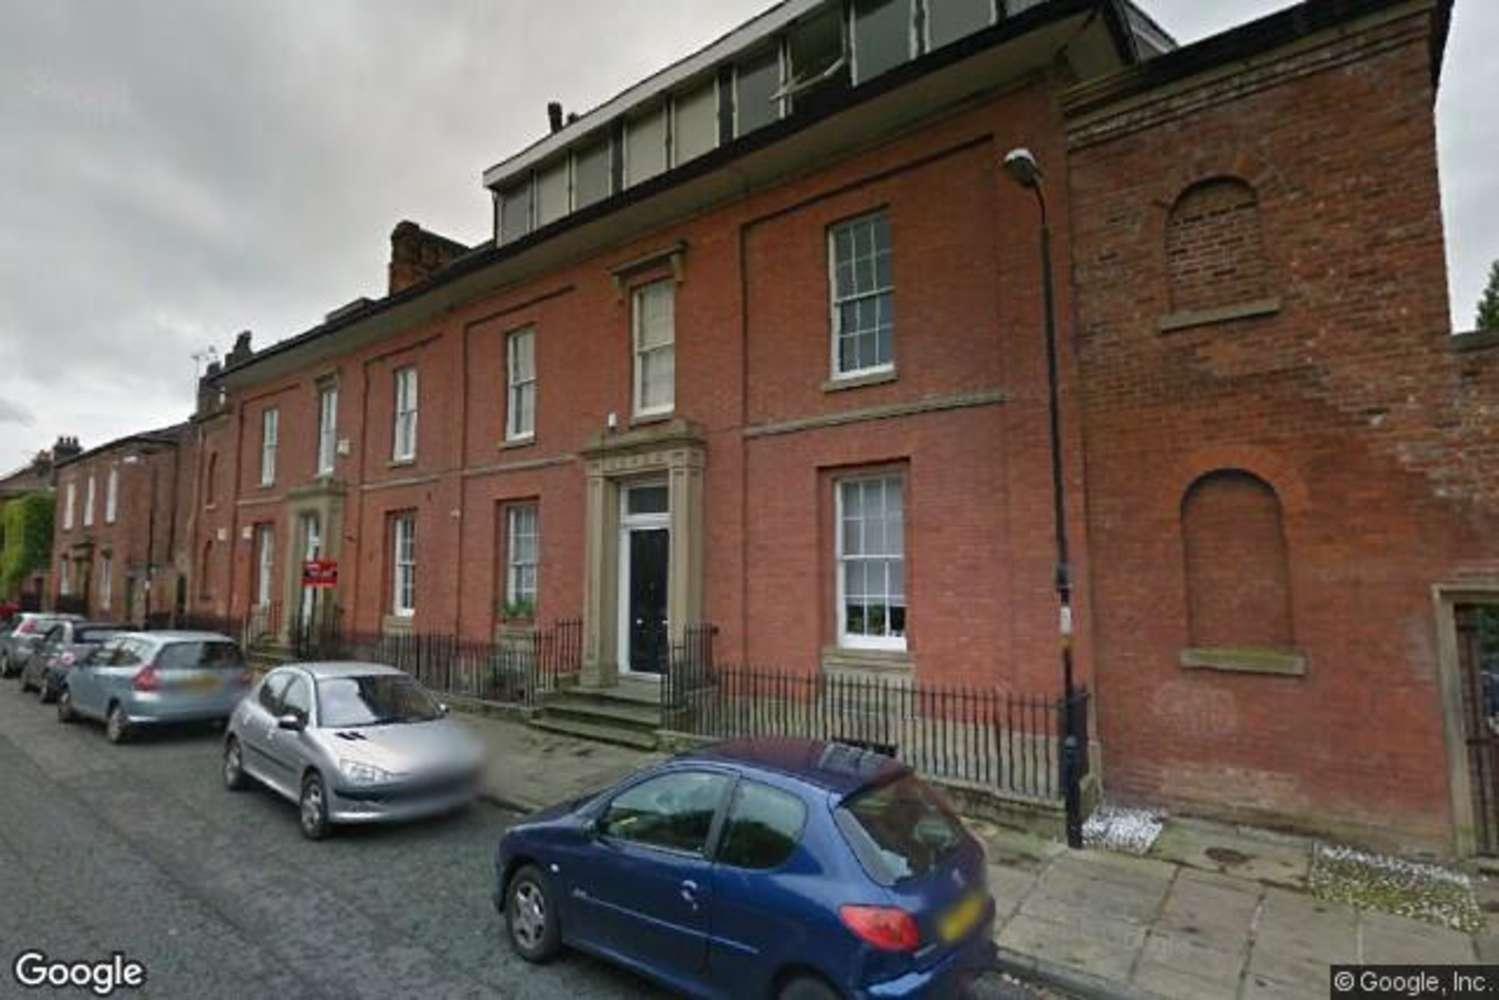 Residential use Preston, PR1 8HU - Flats 1-11 - 55845